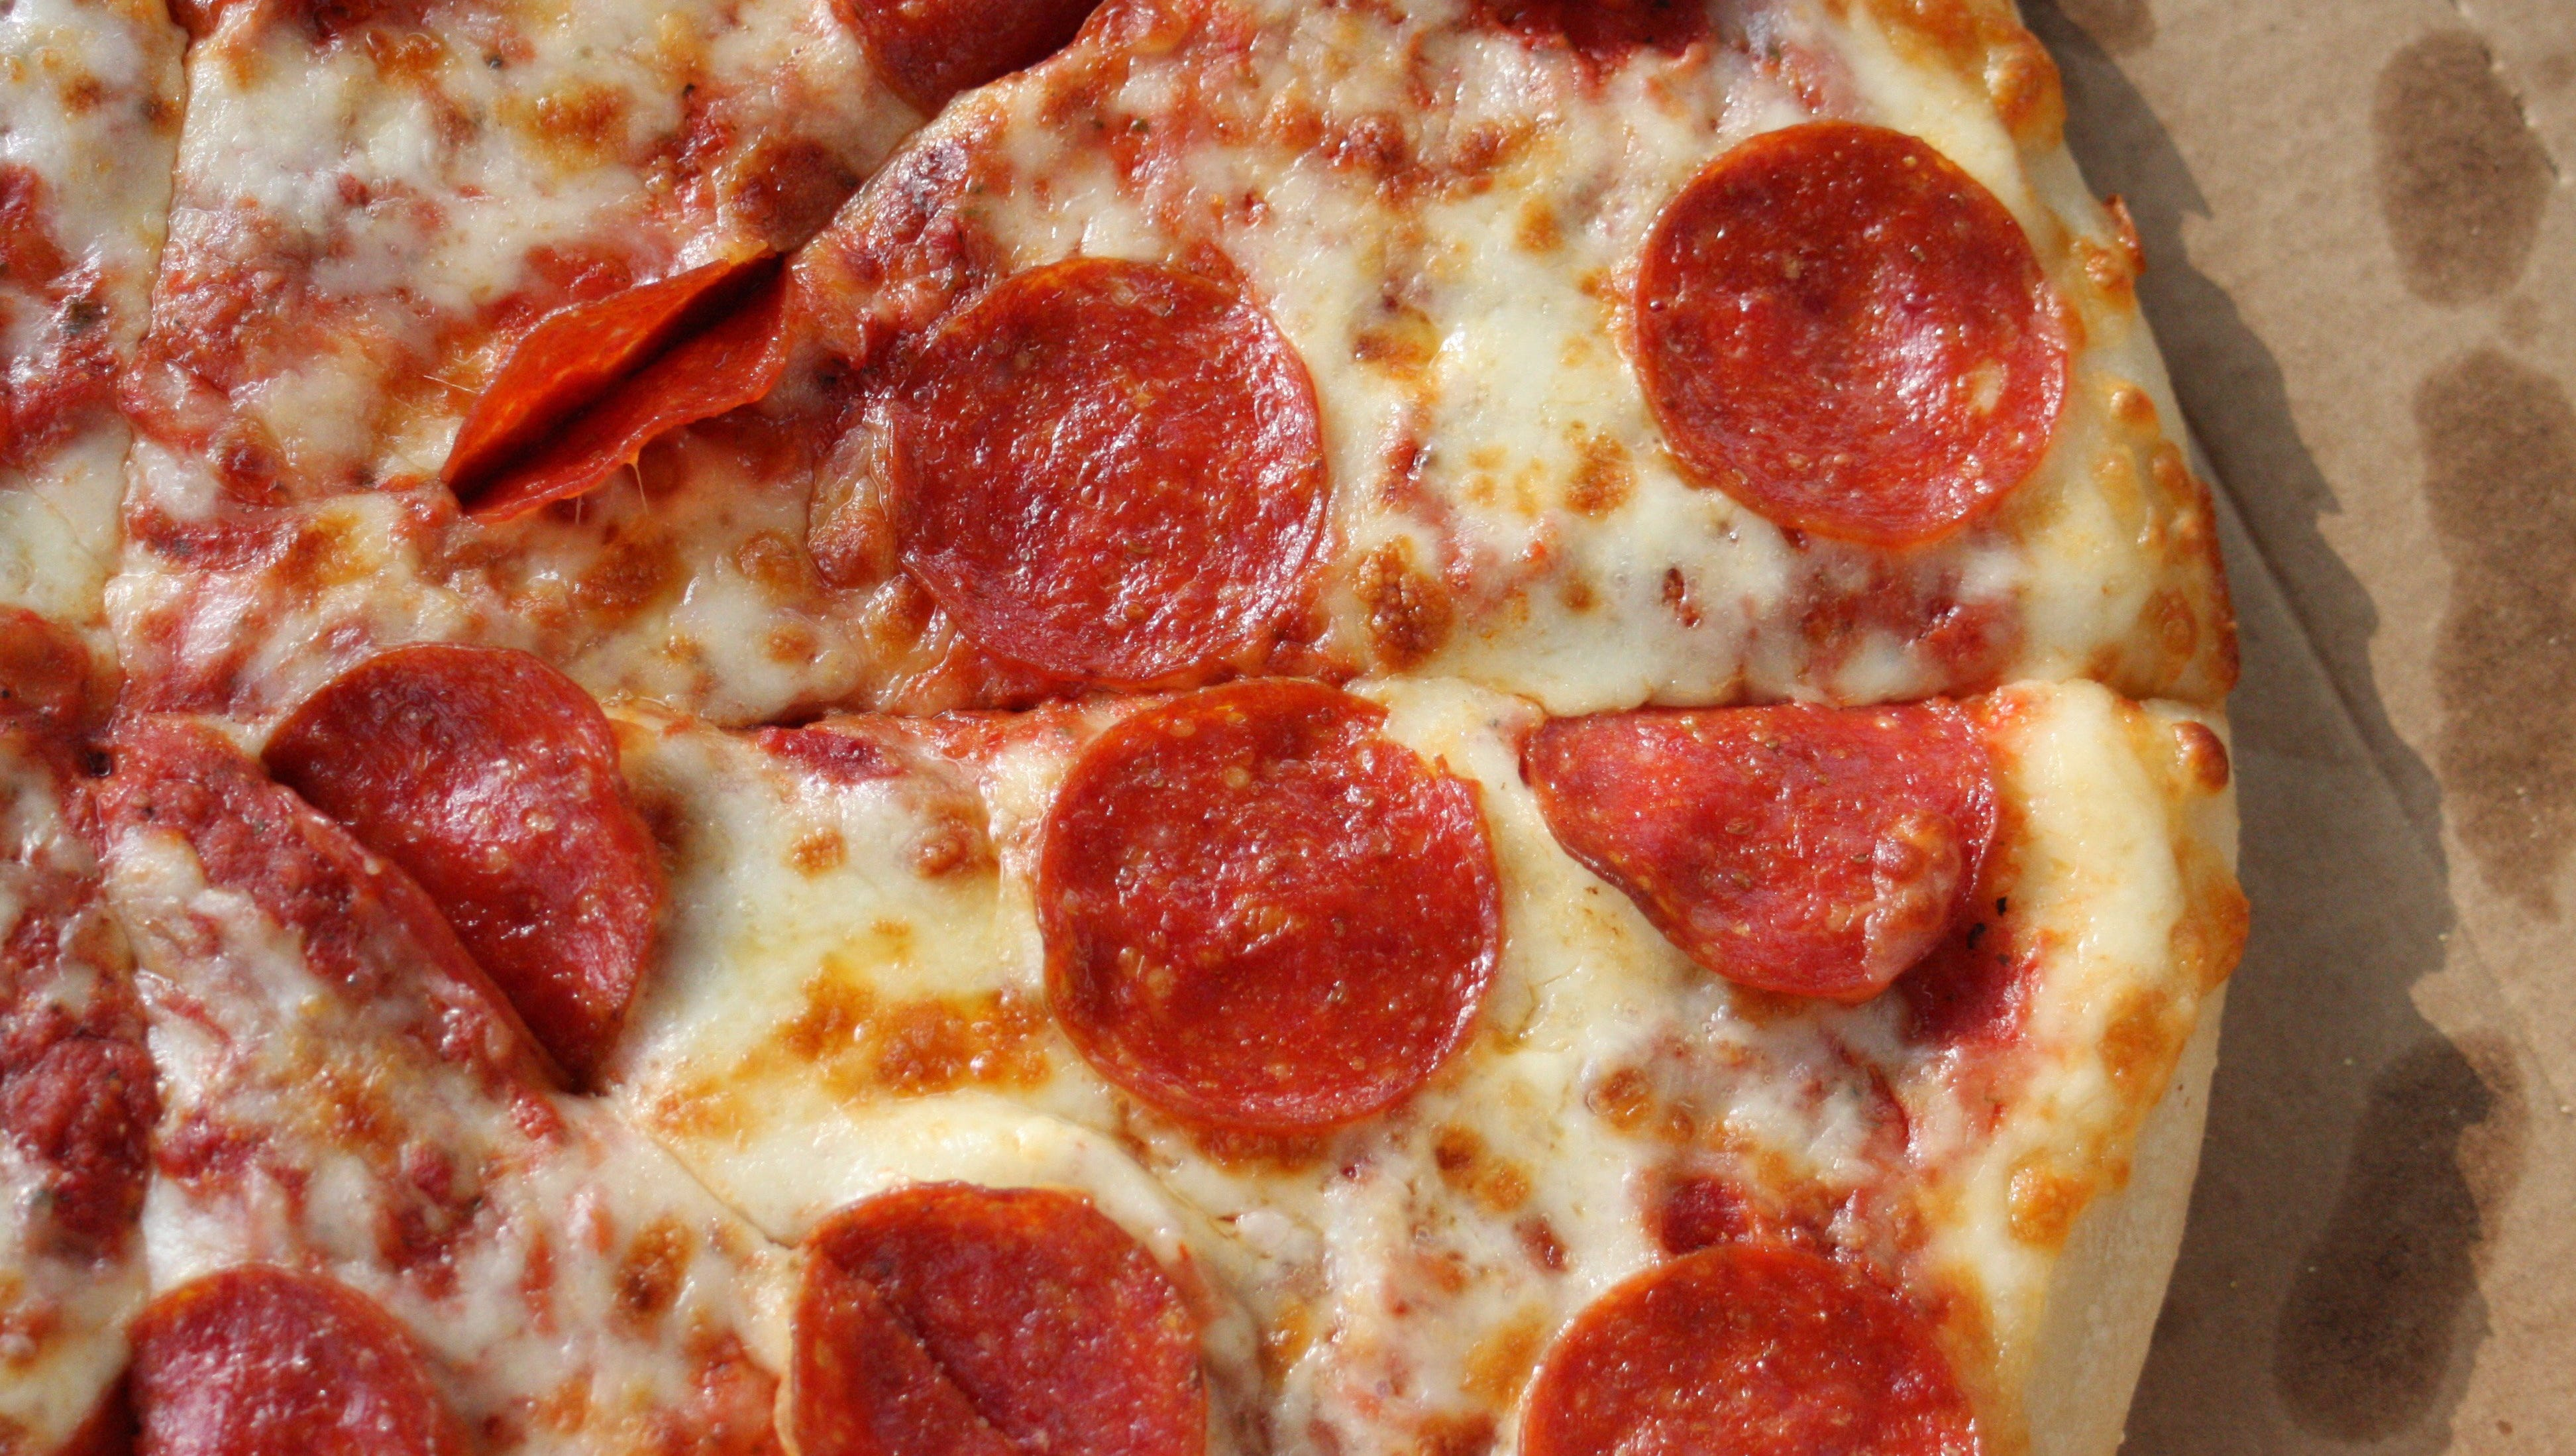 Blue apron halal - Muslim Man Sues Little Caesars Claiming Halal Label On Pizza Was A Lie